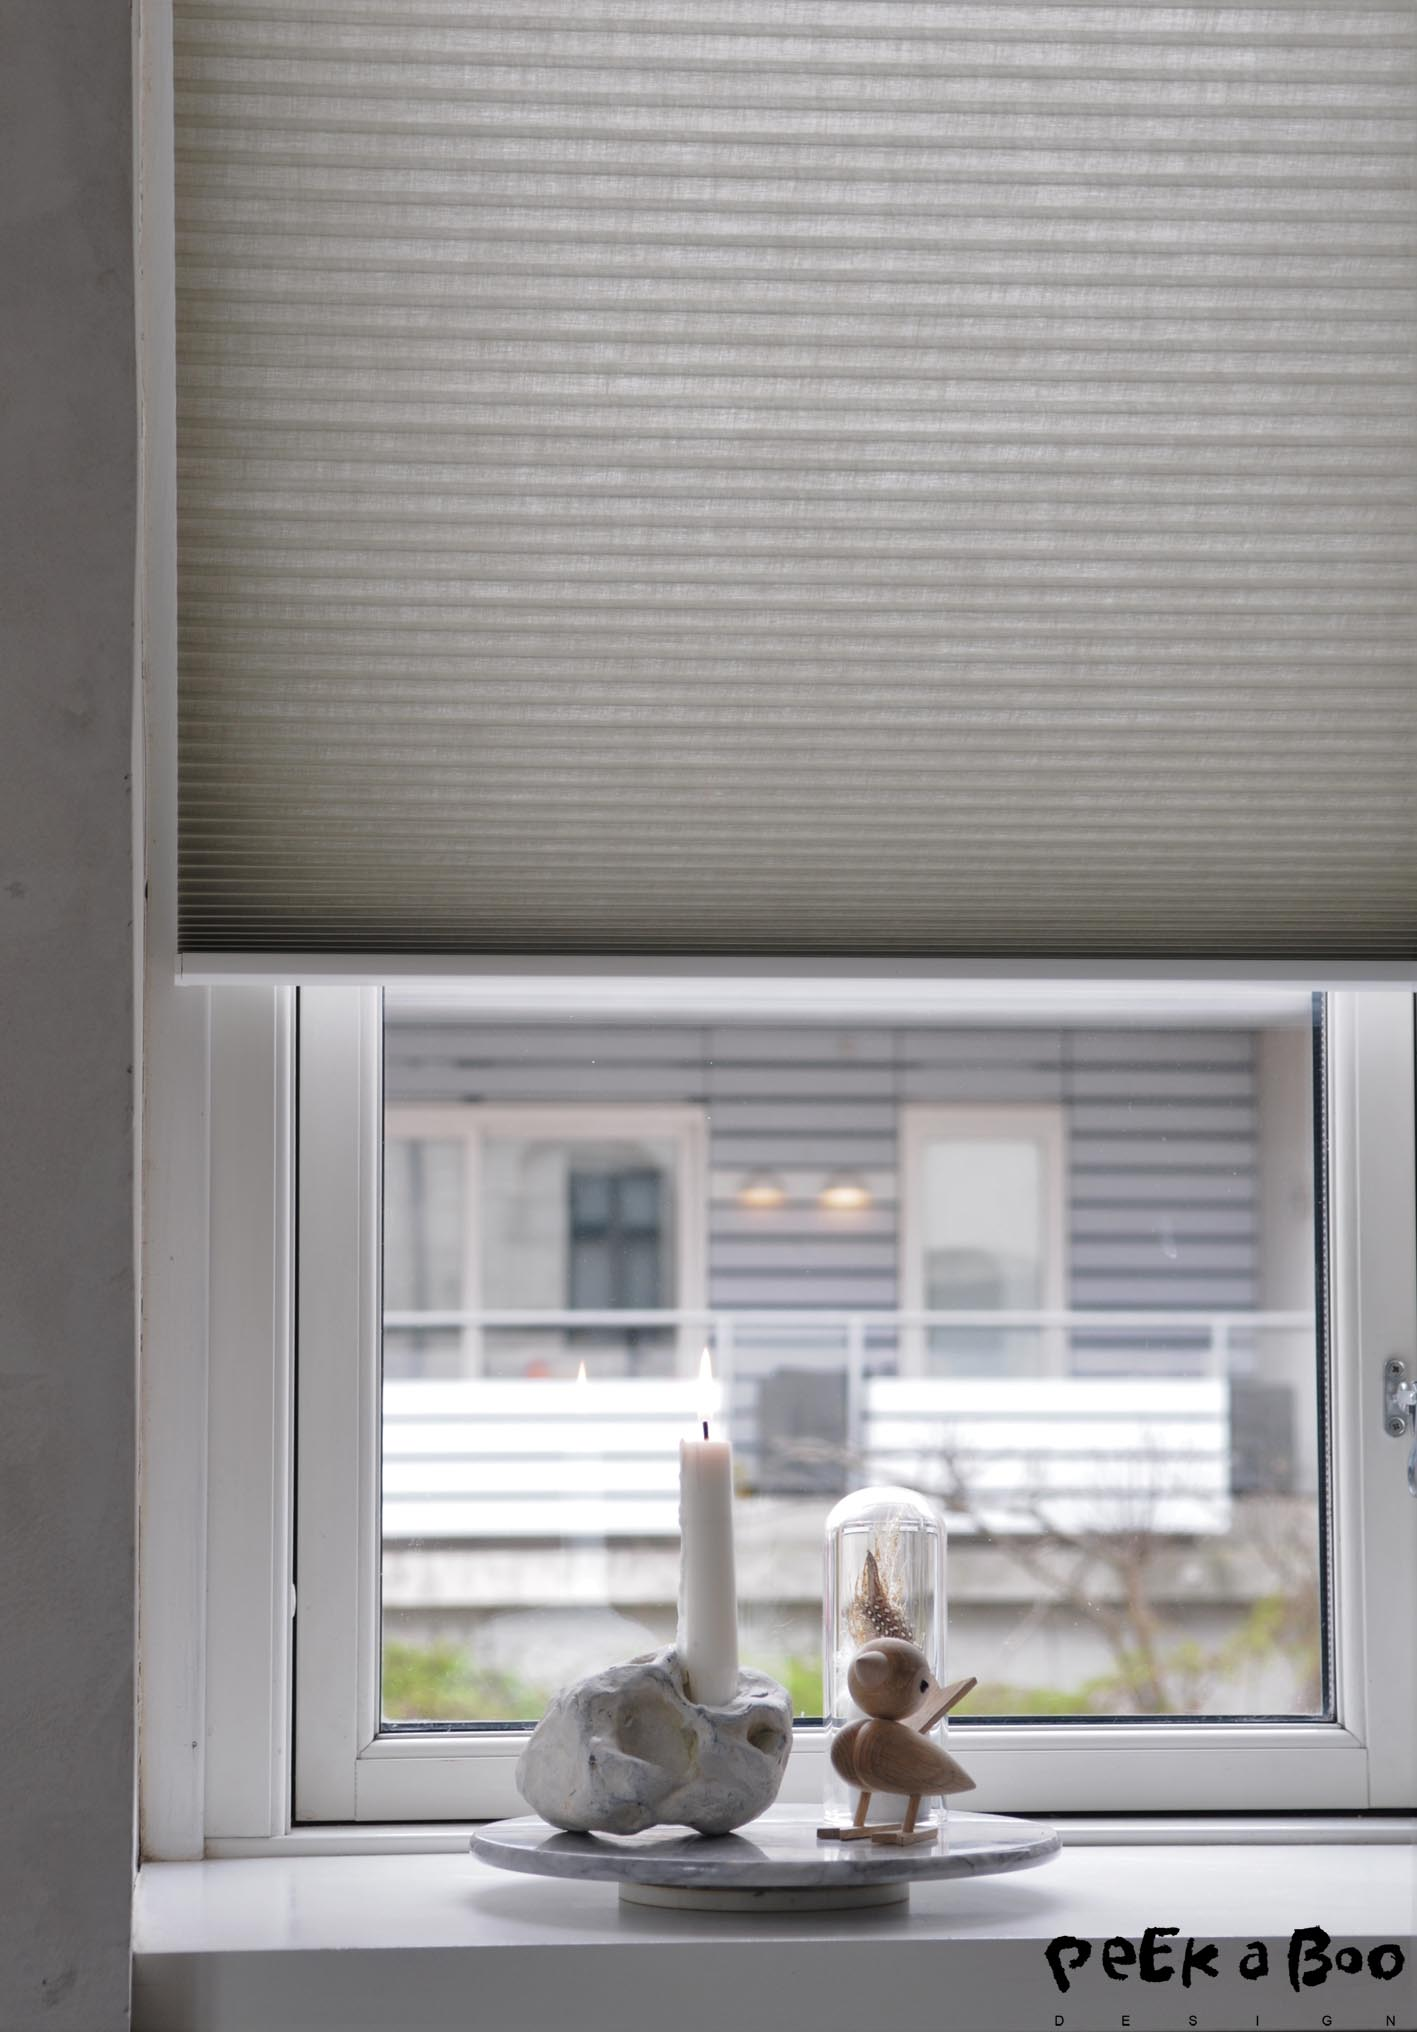 The windowsill invites to make some clean stillebens.